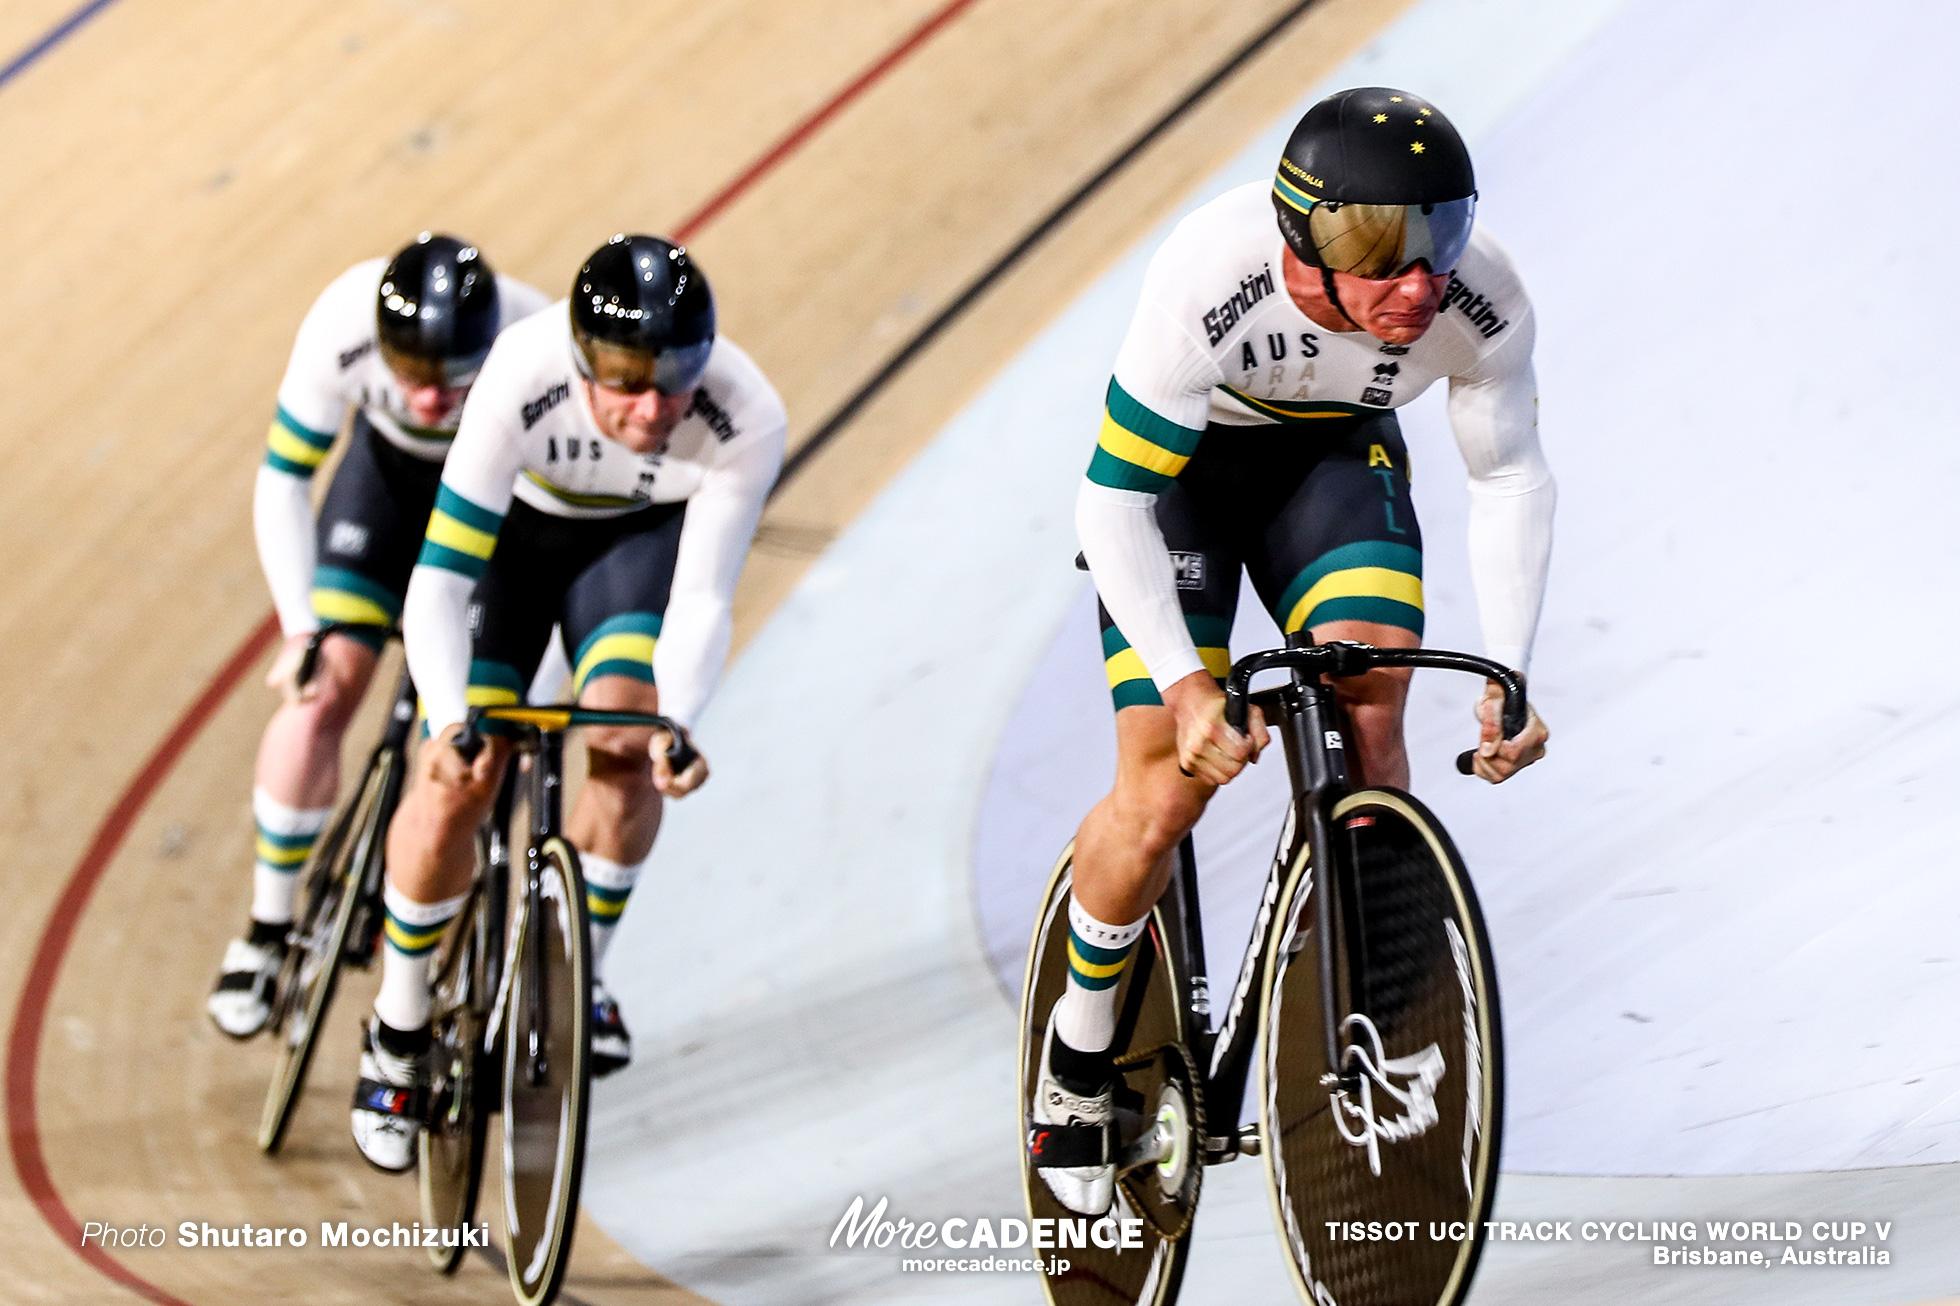 1st Round / Men's Team Sprint / TISSOT UCI TRACK CYCLING WORLD CUP V, Brisbane, Australia